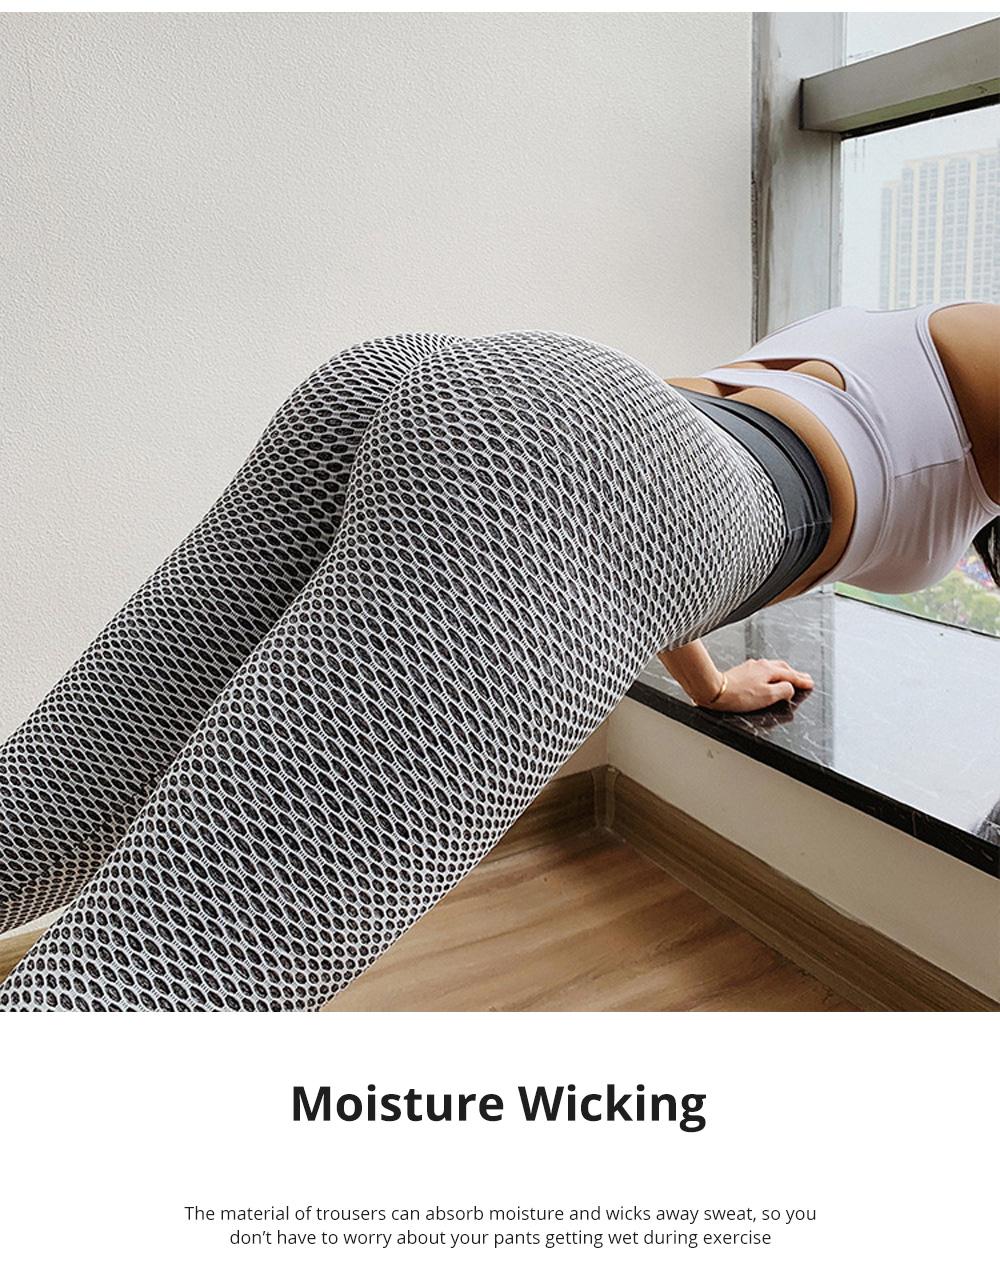 Women Wearing Tight Yoga Pants Fitness Seamless High Quality Workout Leggings High Waist Stretch Sports Yoga Pants 4